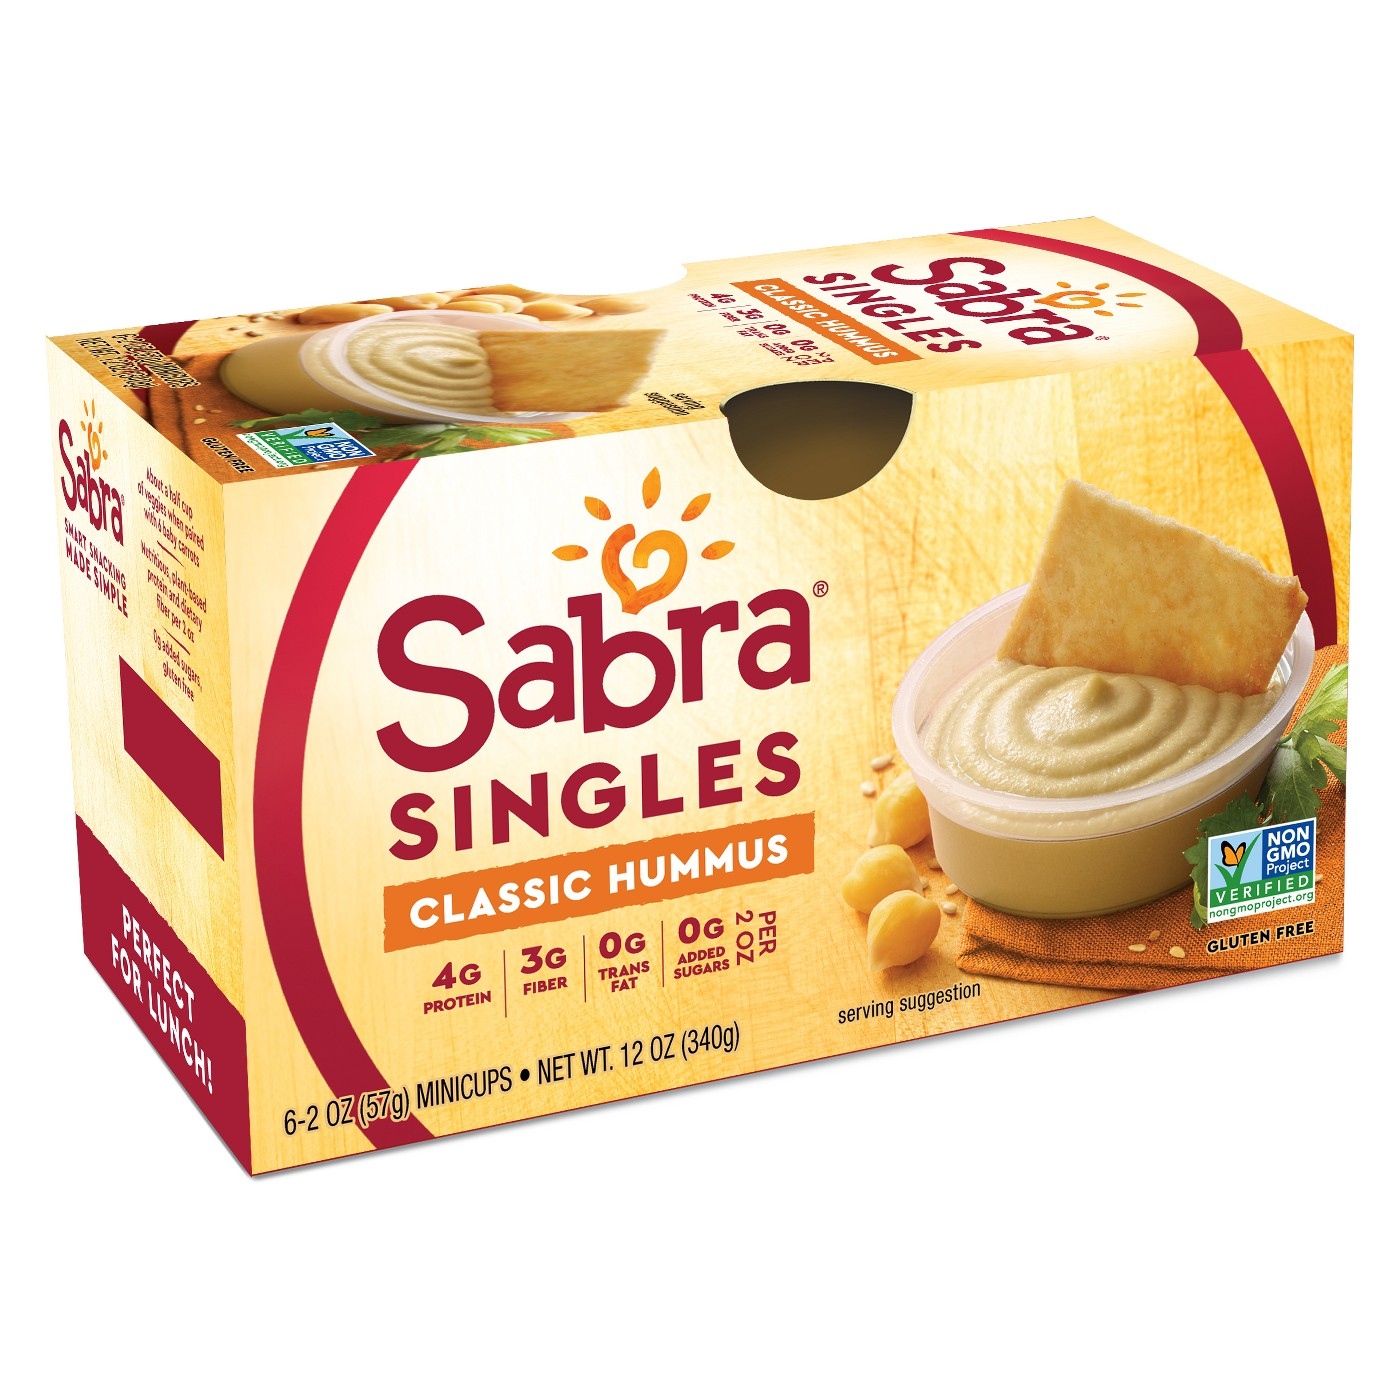 Sabra Classic Hummus Singles Dips - 6ct - image 4 of 5